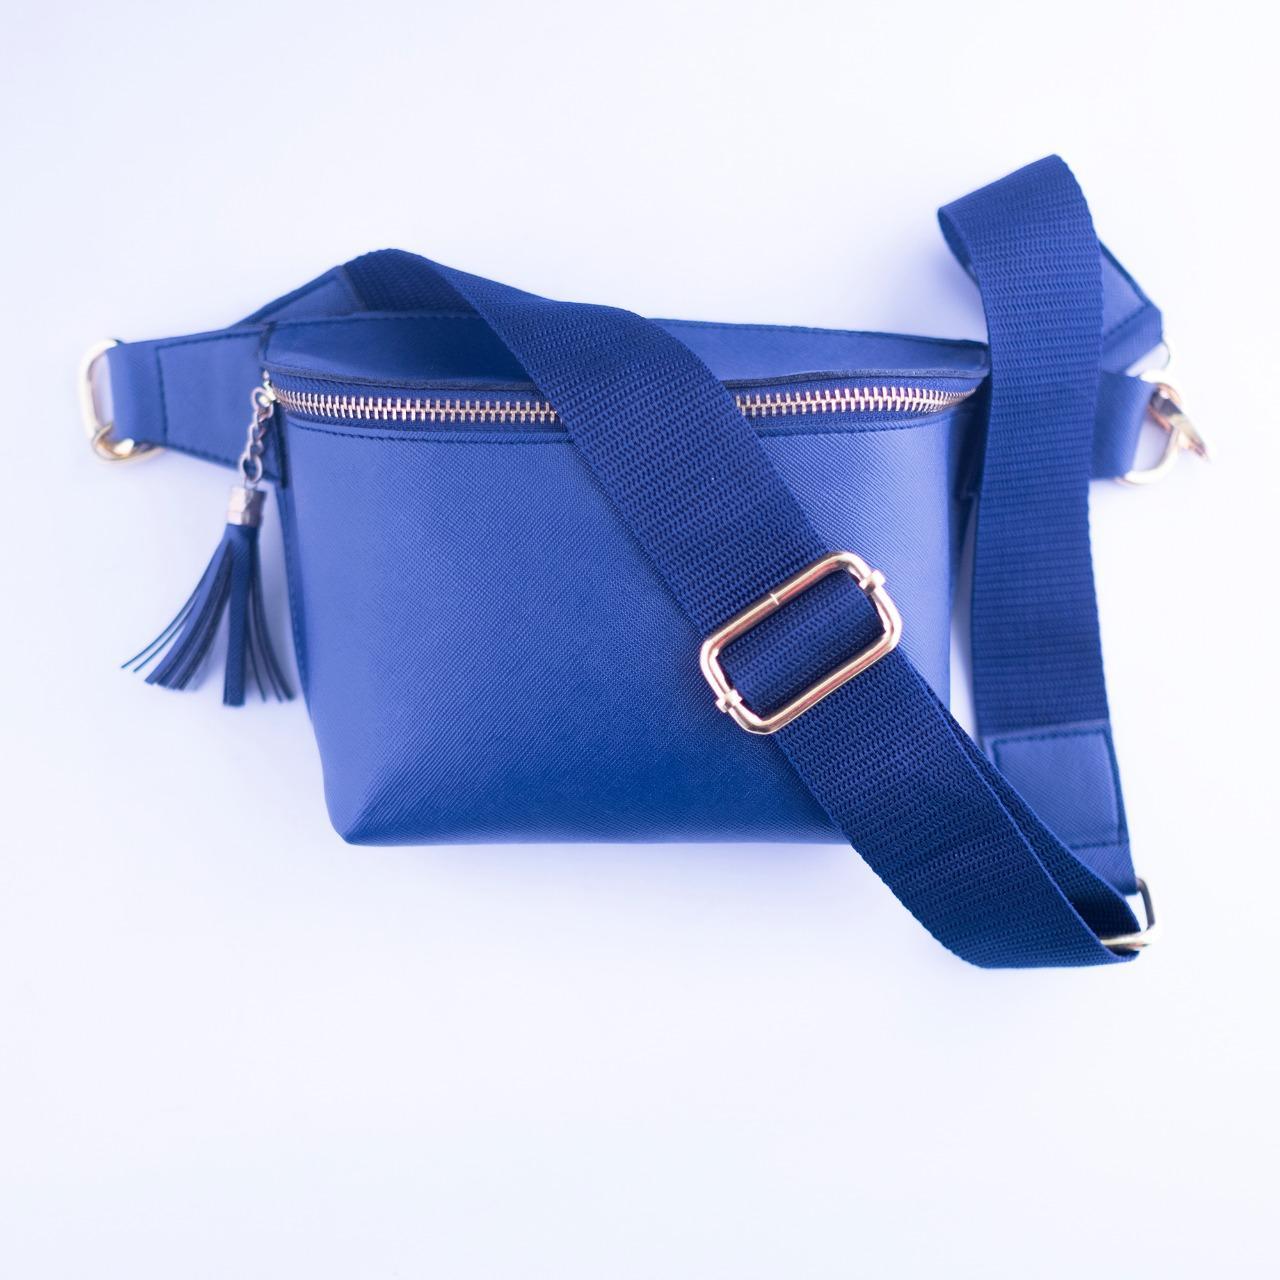 Rp 125.500. Tas Selempang Fanny Bag Fashion Wanita Chest ...